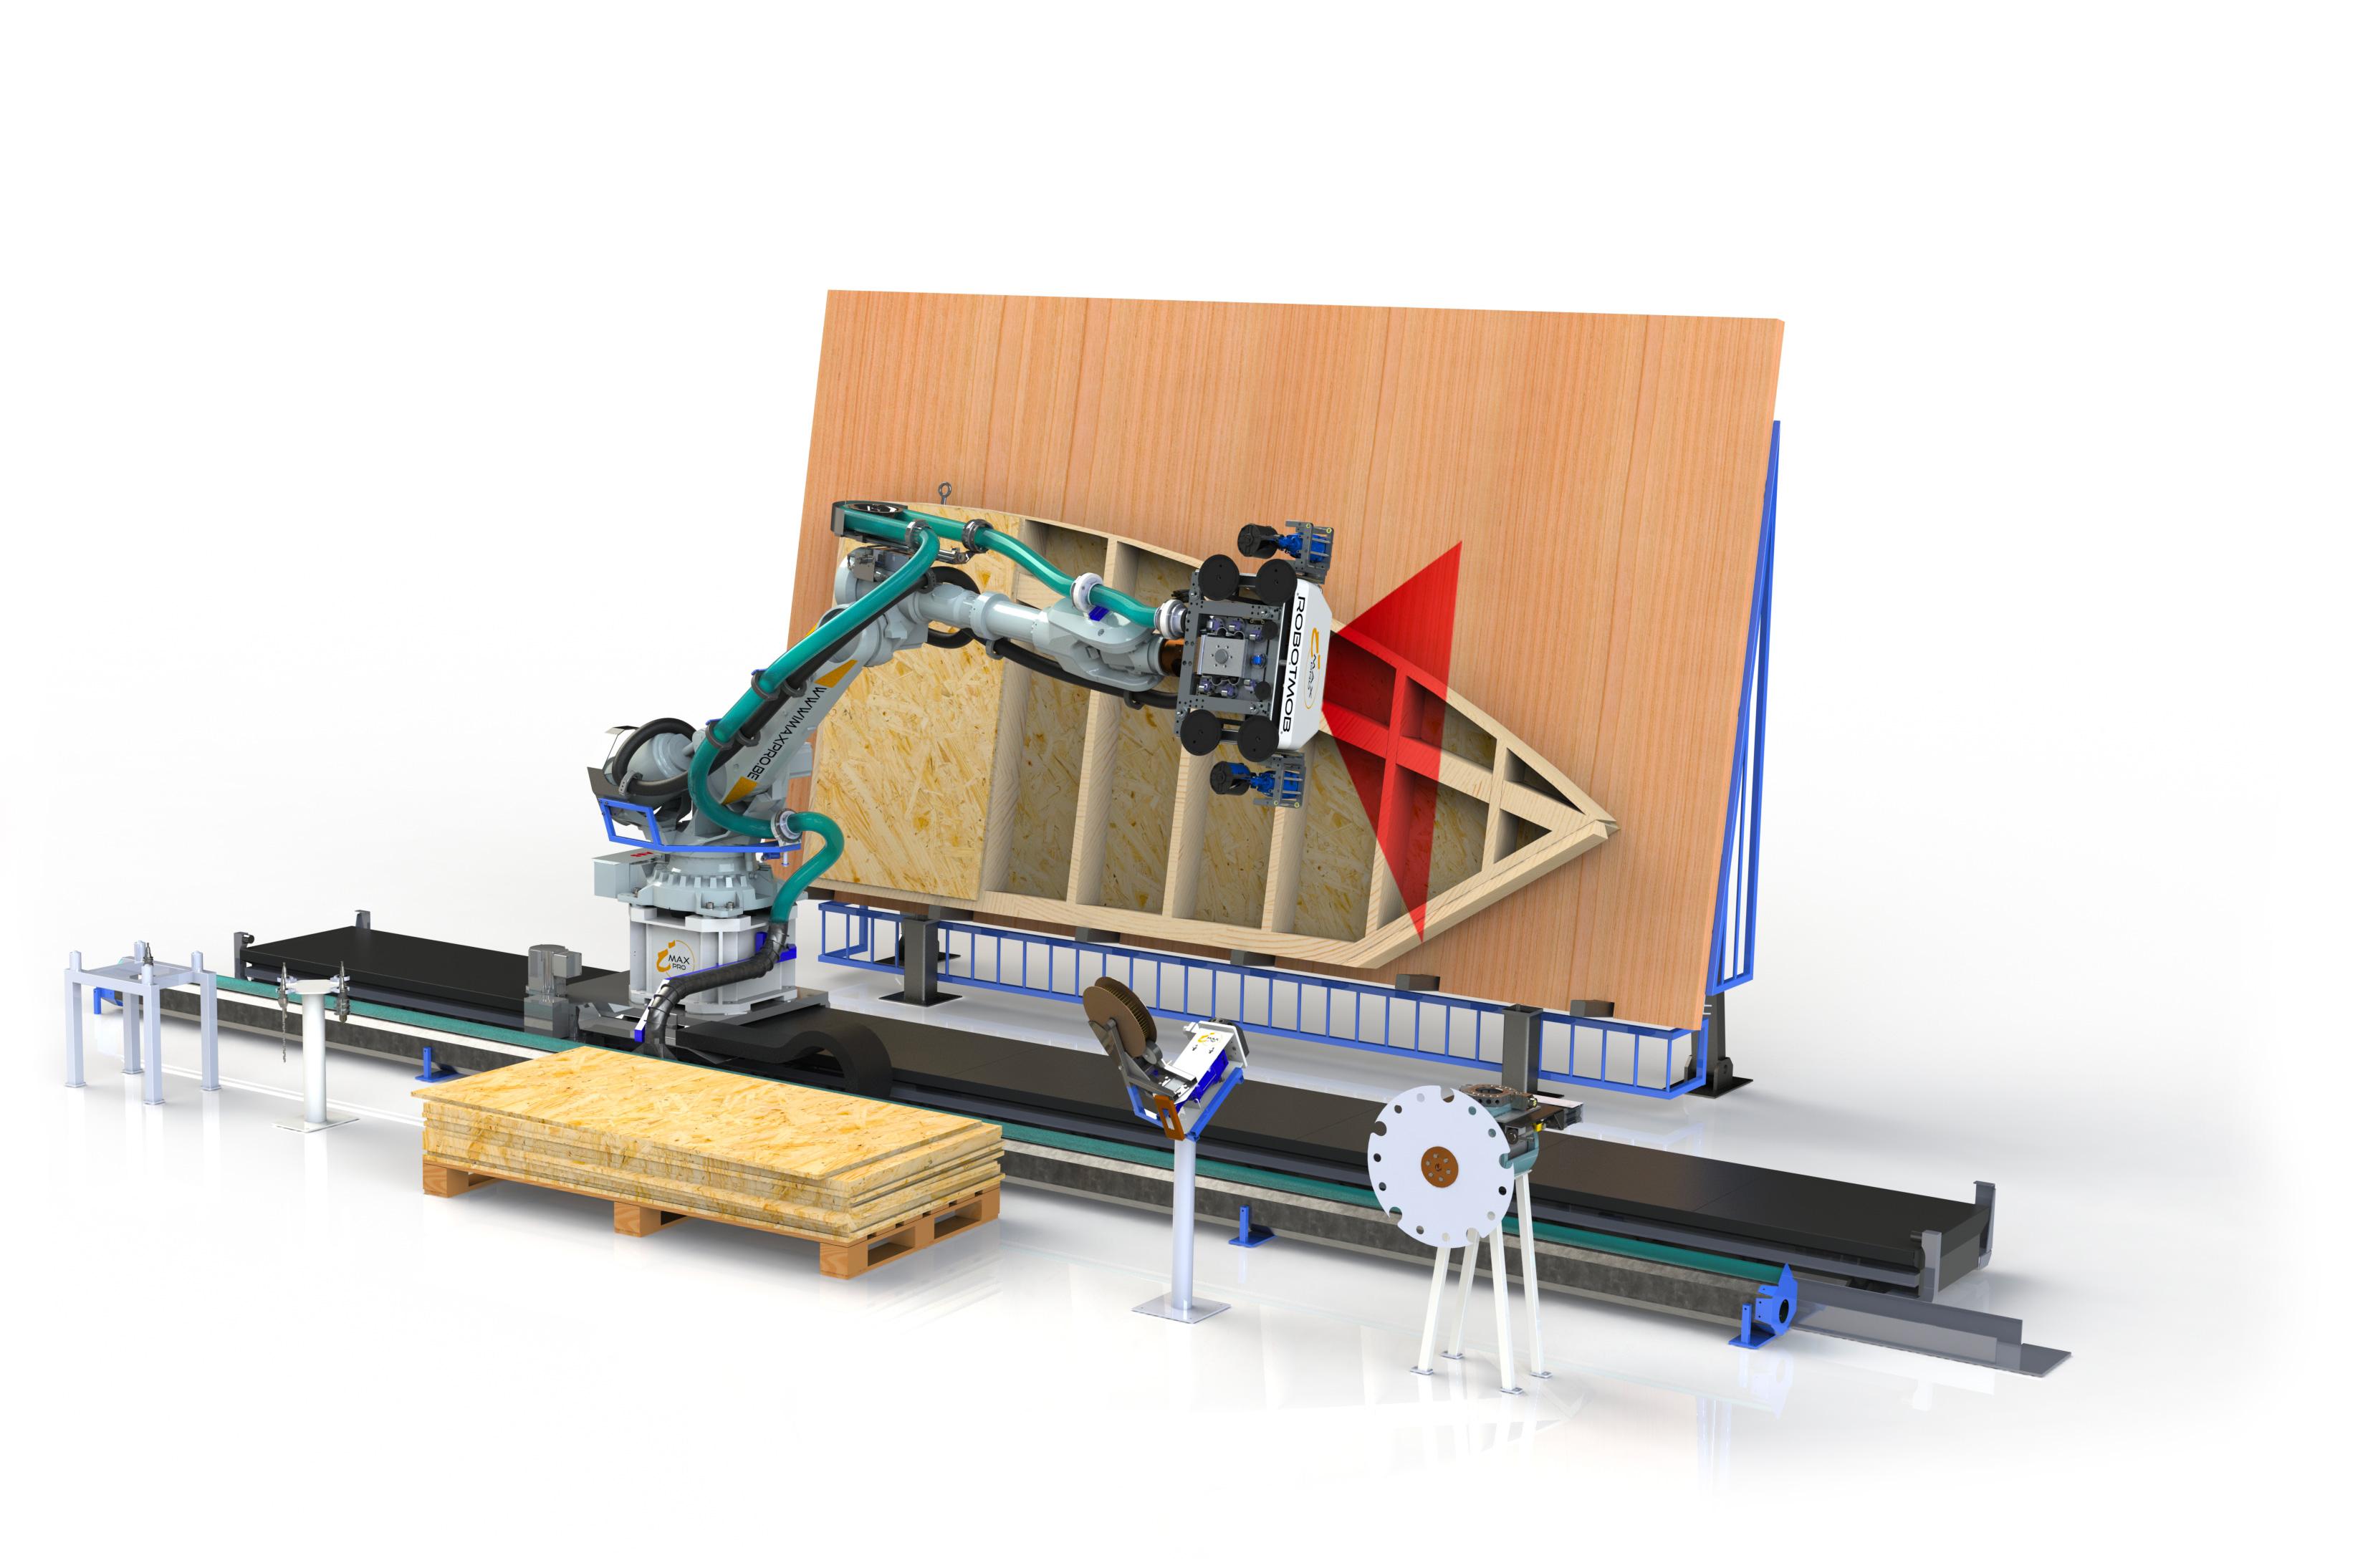 Robotmob Scanning panels